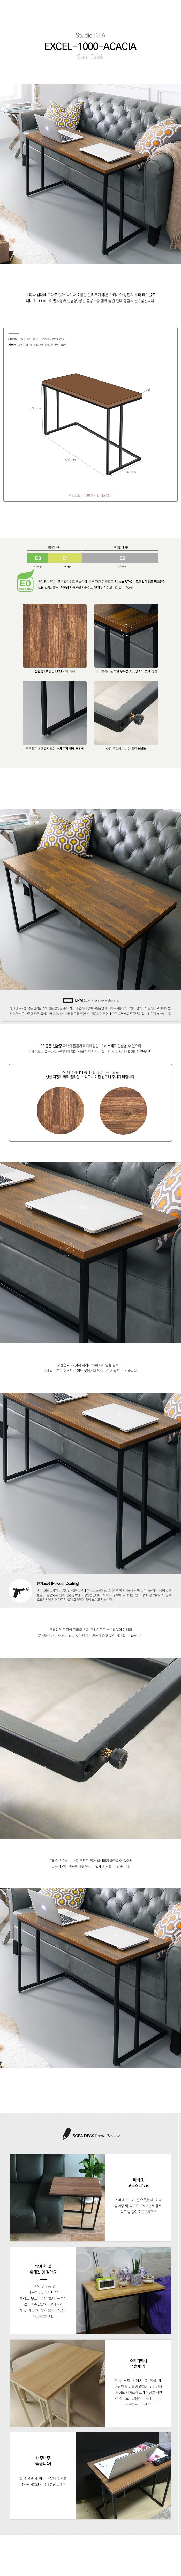 Aspen-1000-Acacia-Sofa Desk.jpg